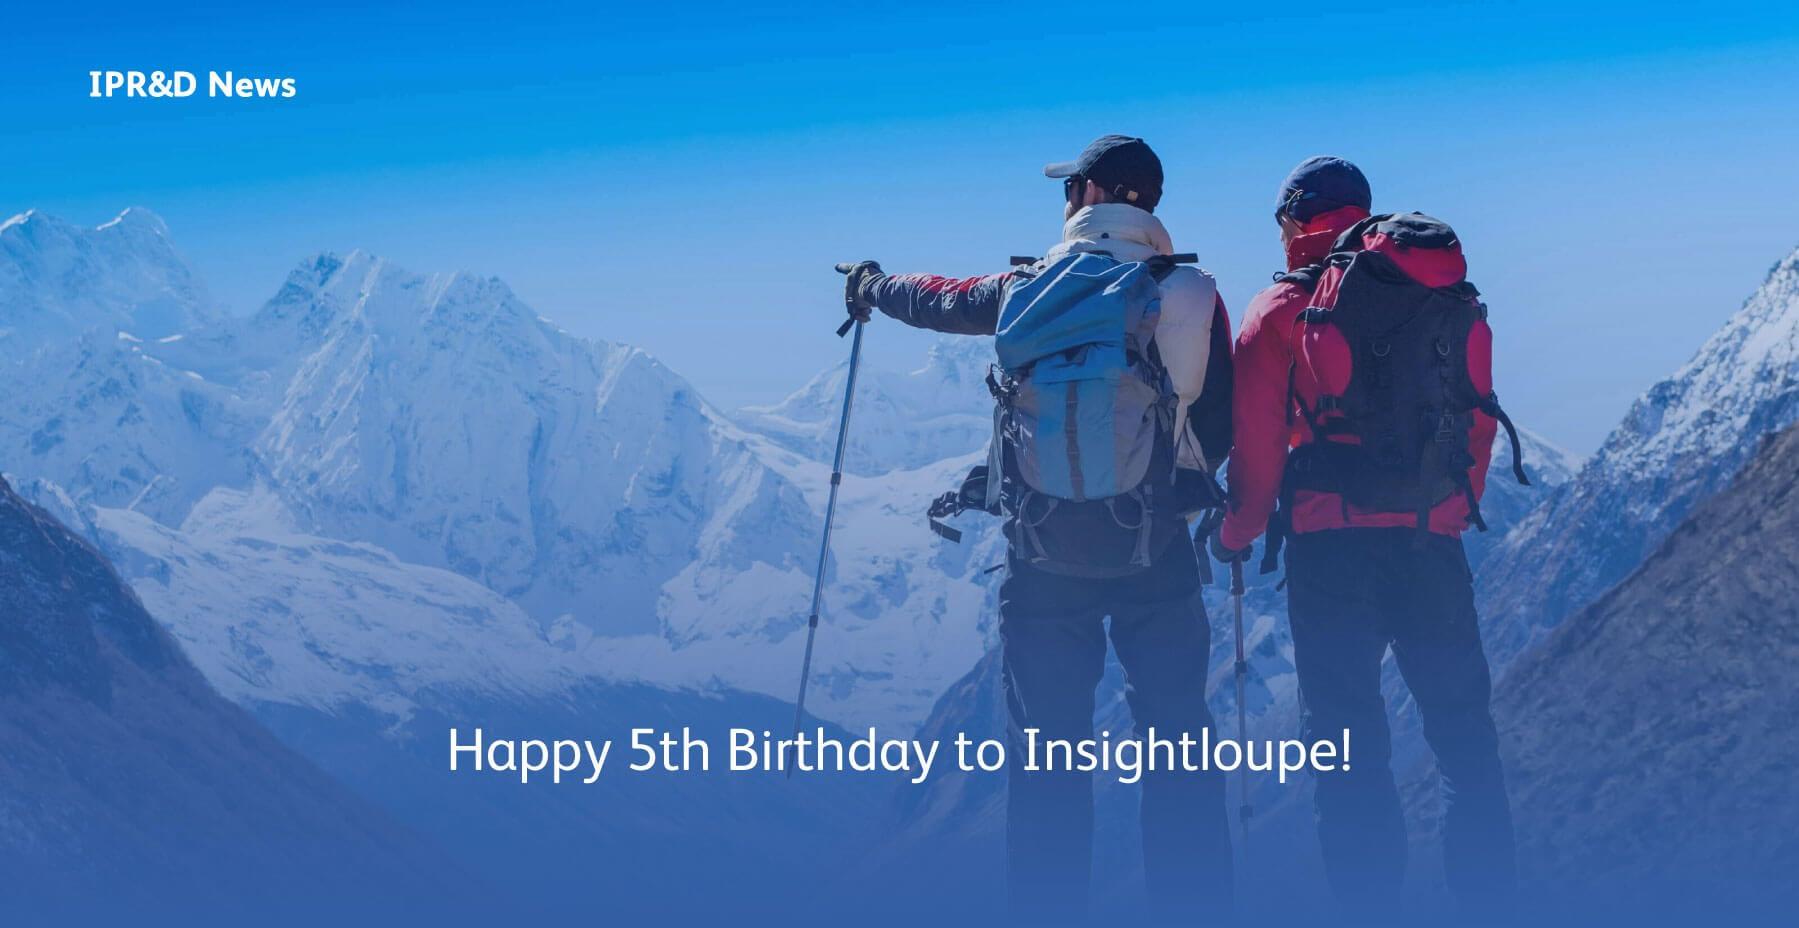 Evalueserve Insightloupe - Happy 5th Birthday to Insightloupe